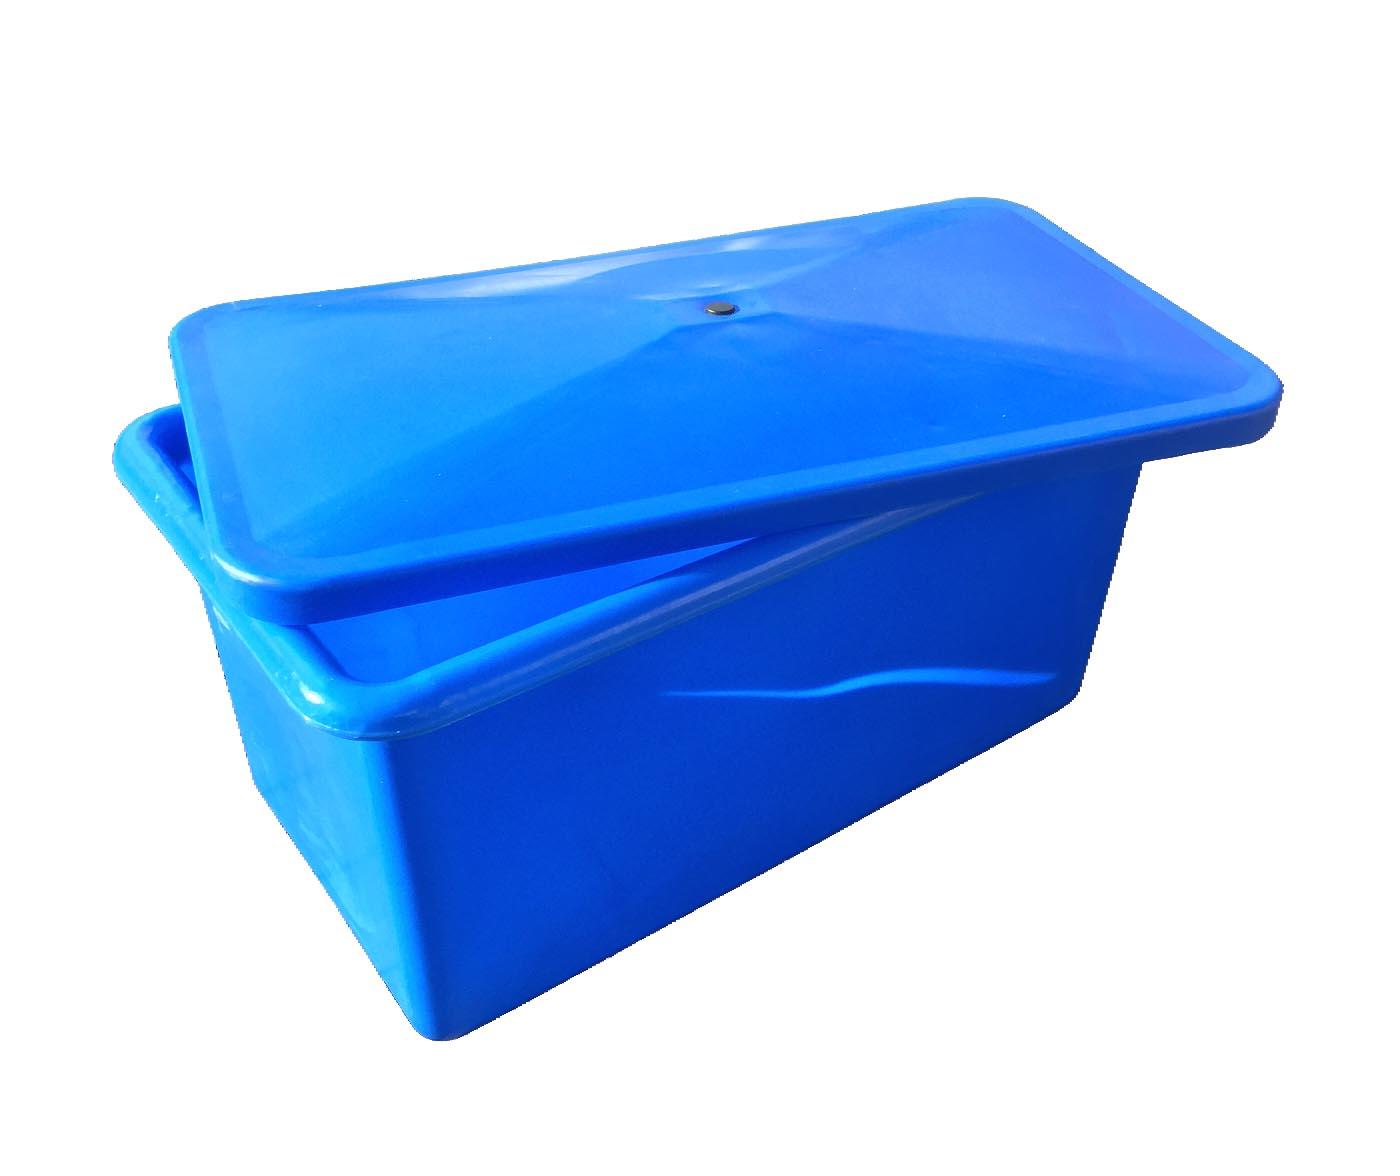 plastic box in blue